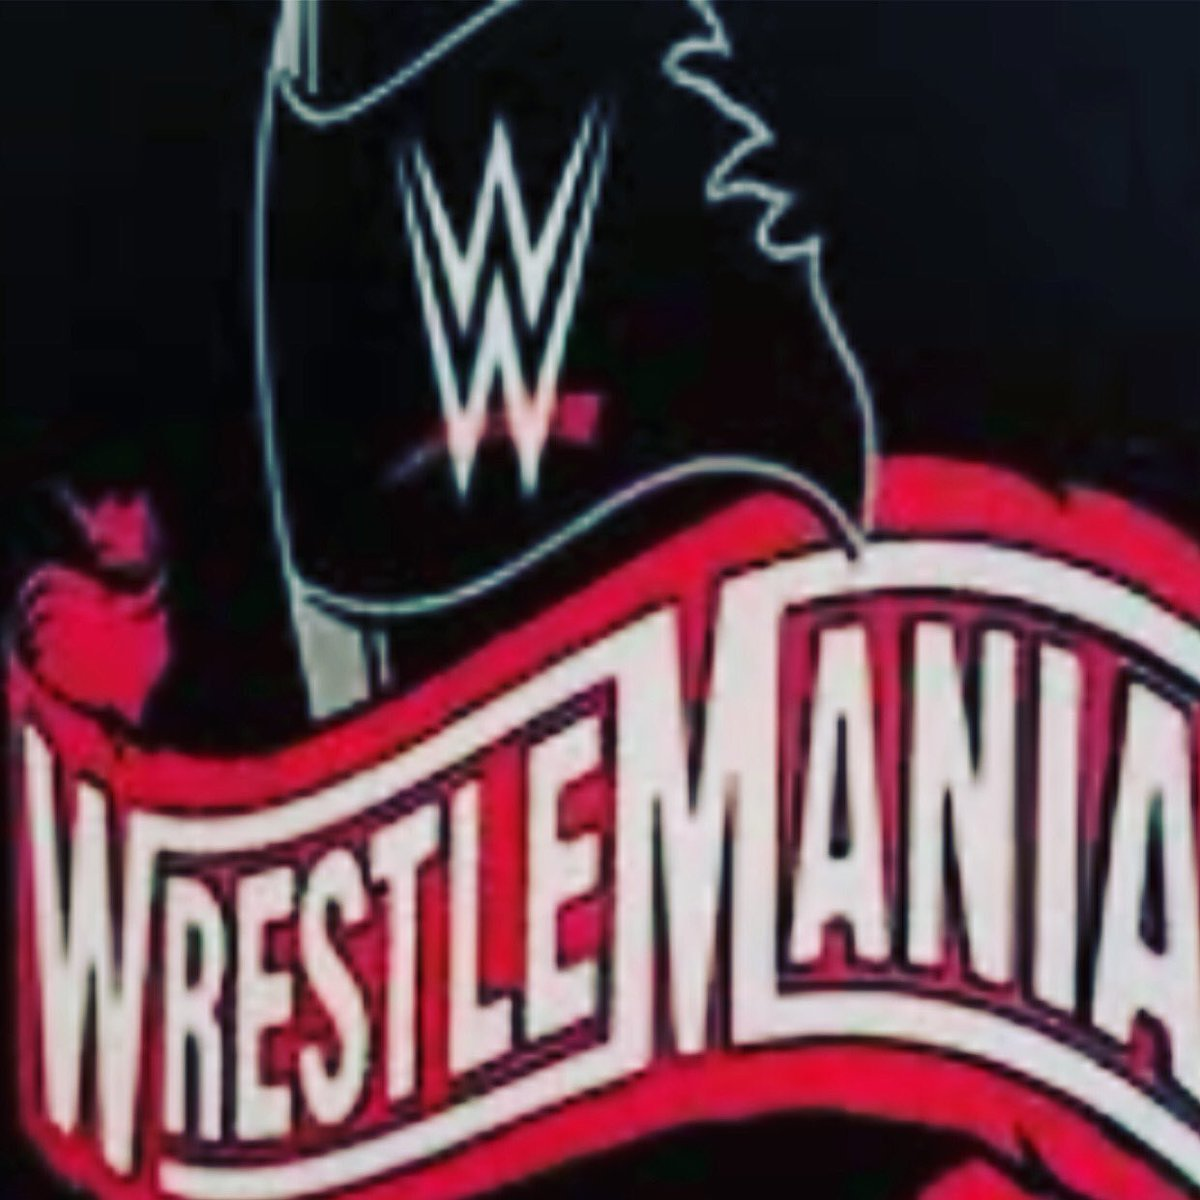 WrestleMania Baby https://t.co/oyWaHYDkdd